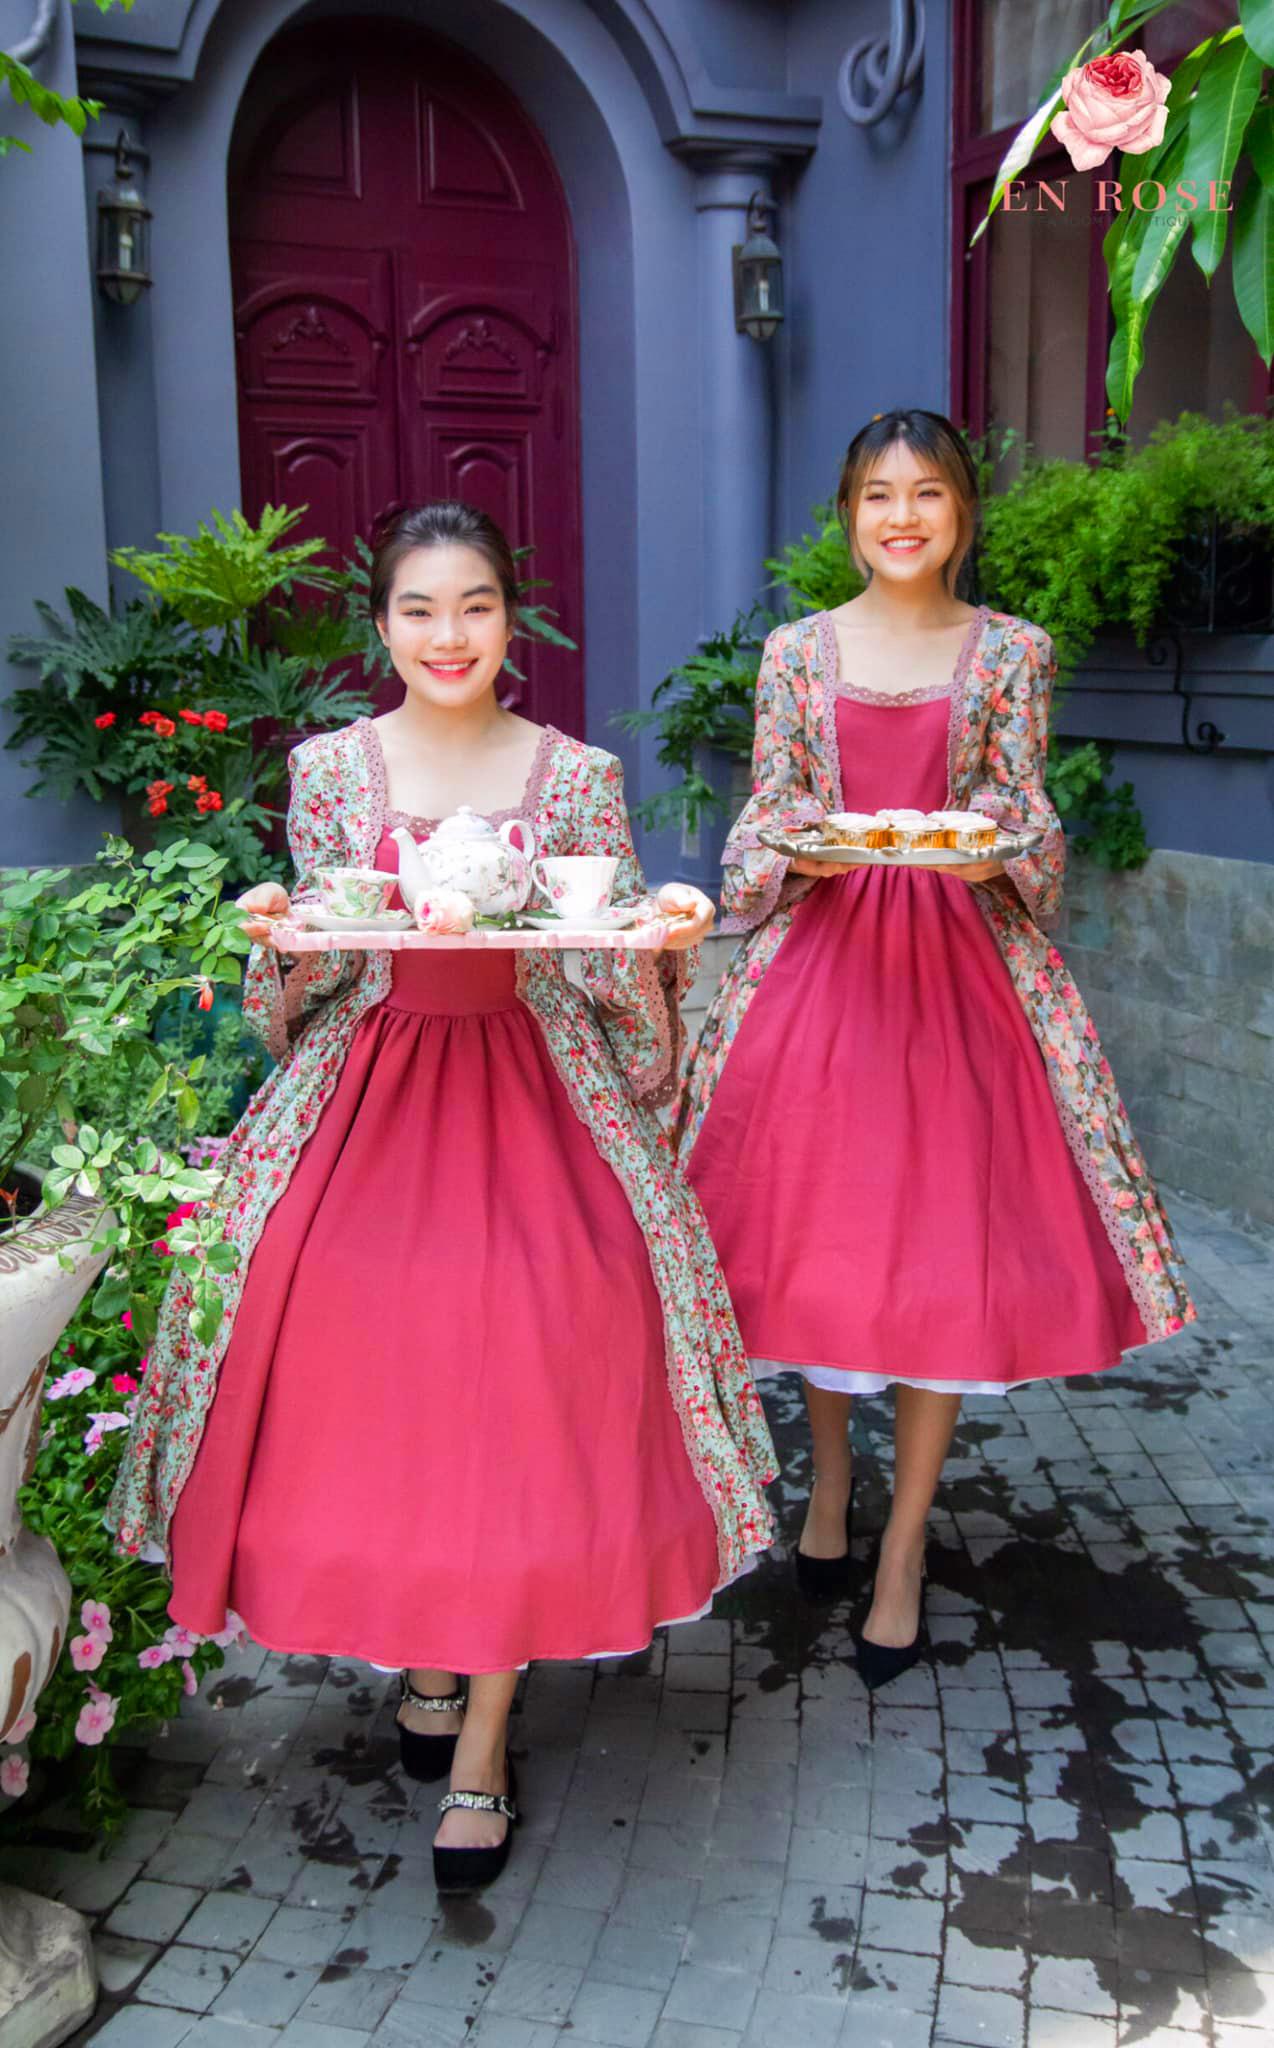 En Rose tea house staff